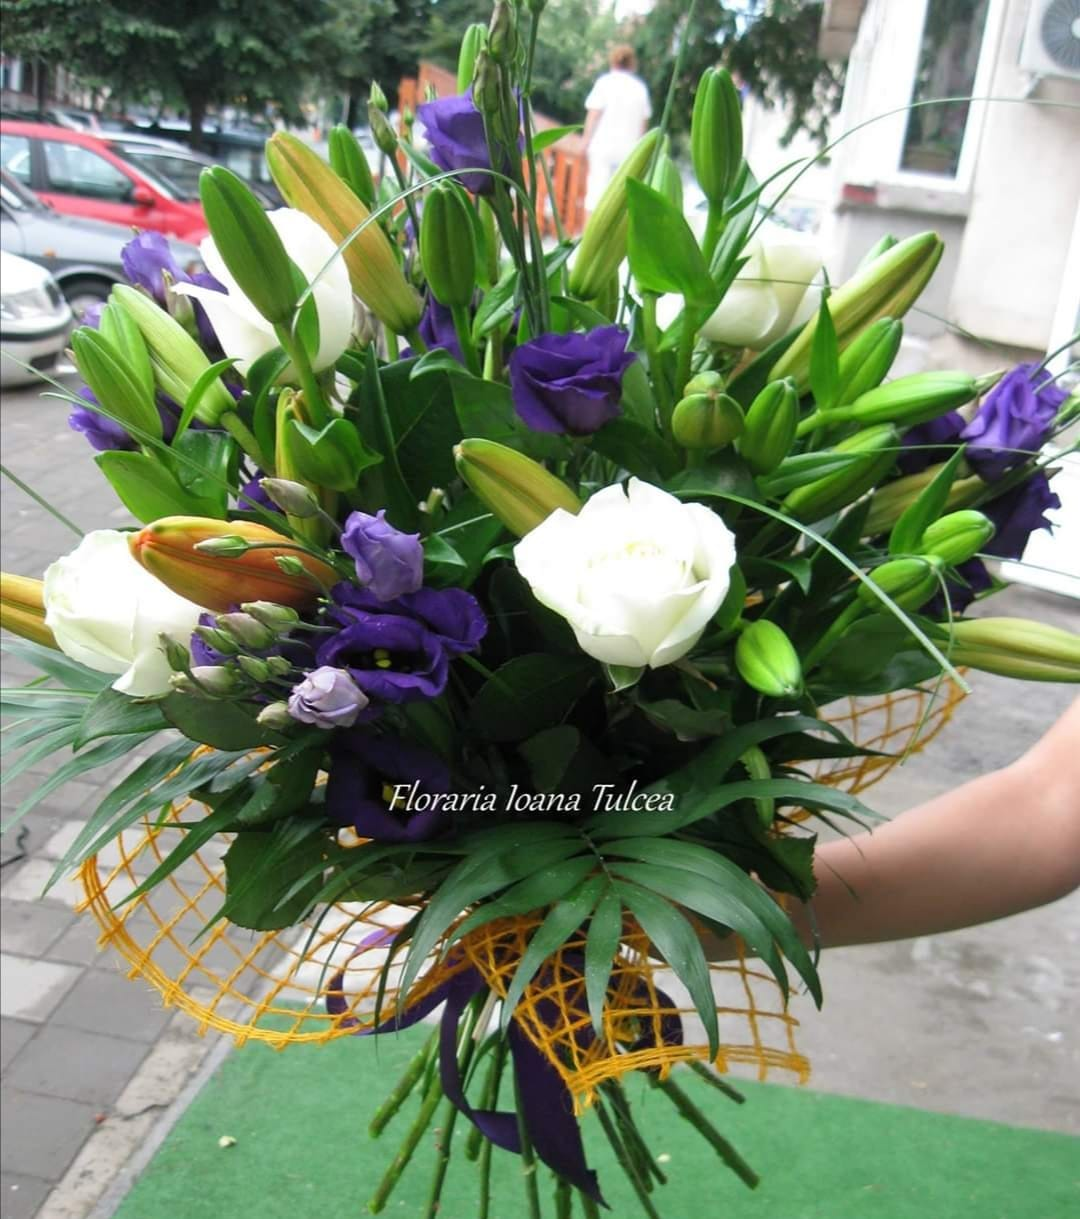 Buchet 7 trandafiri albi, 5 crini, 5 liziantus mov preț 175 lei